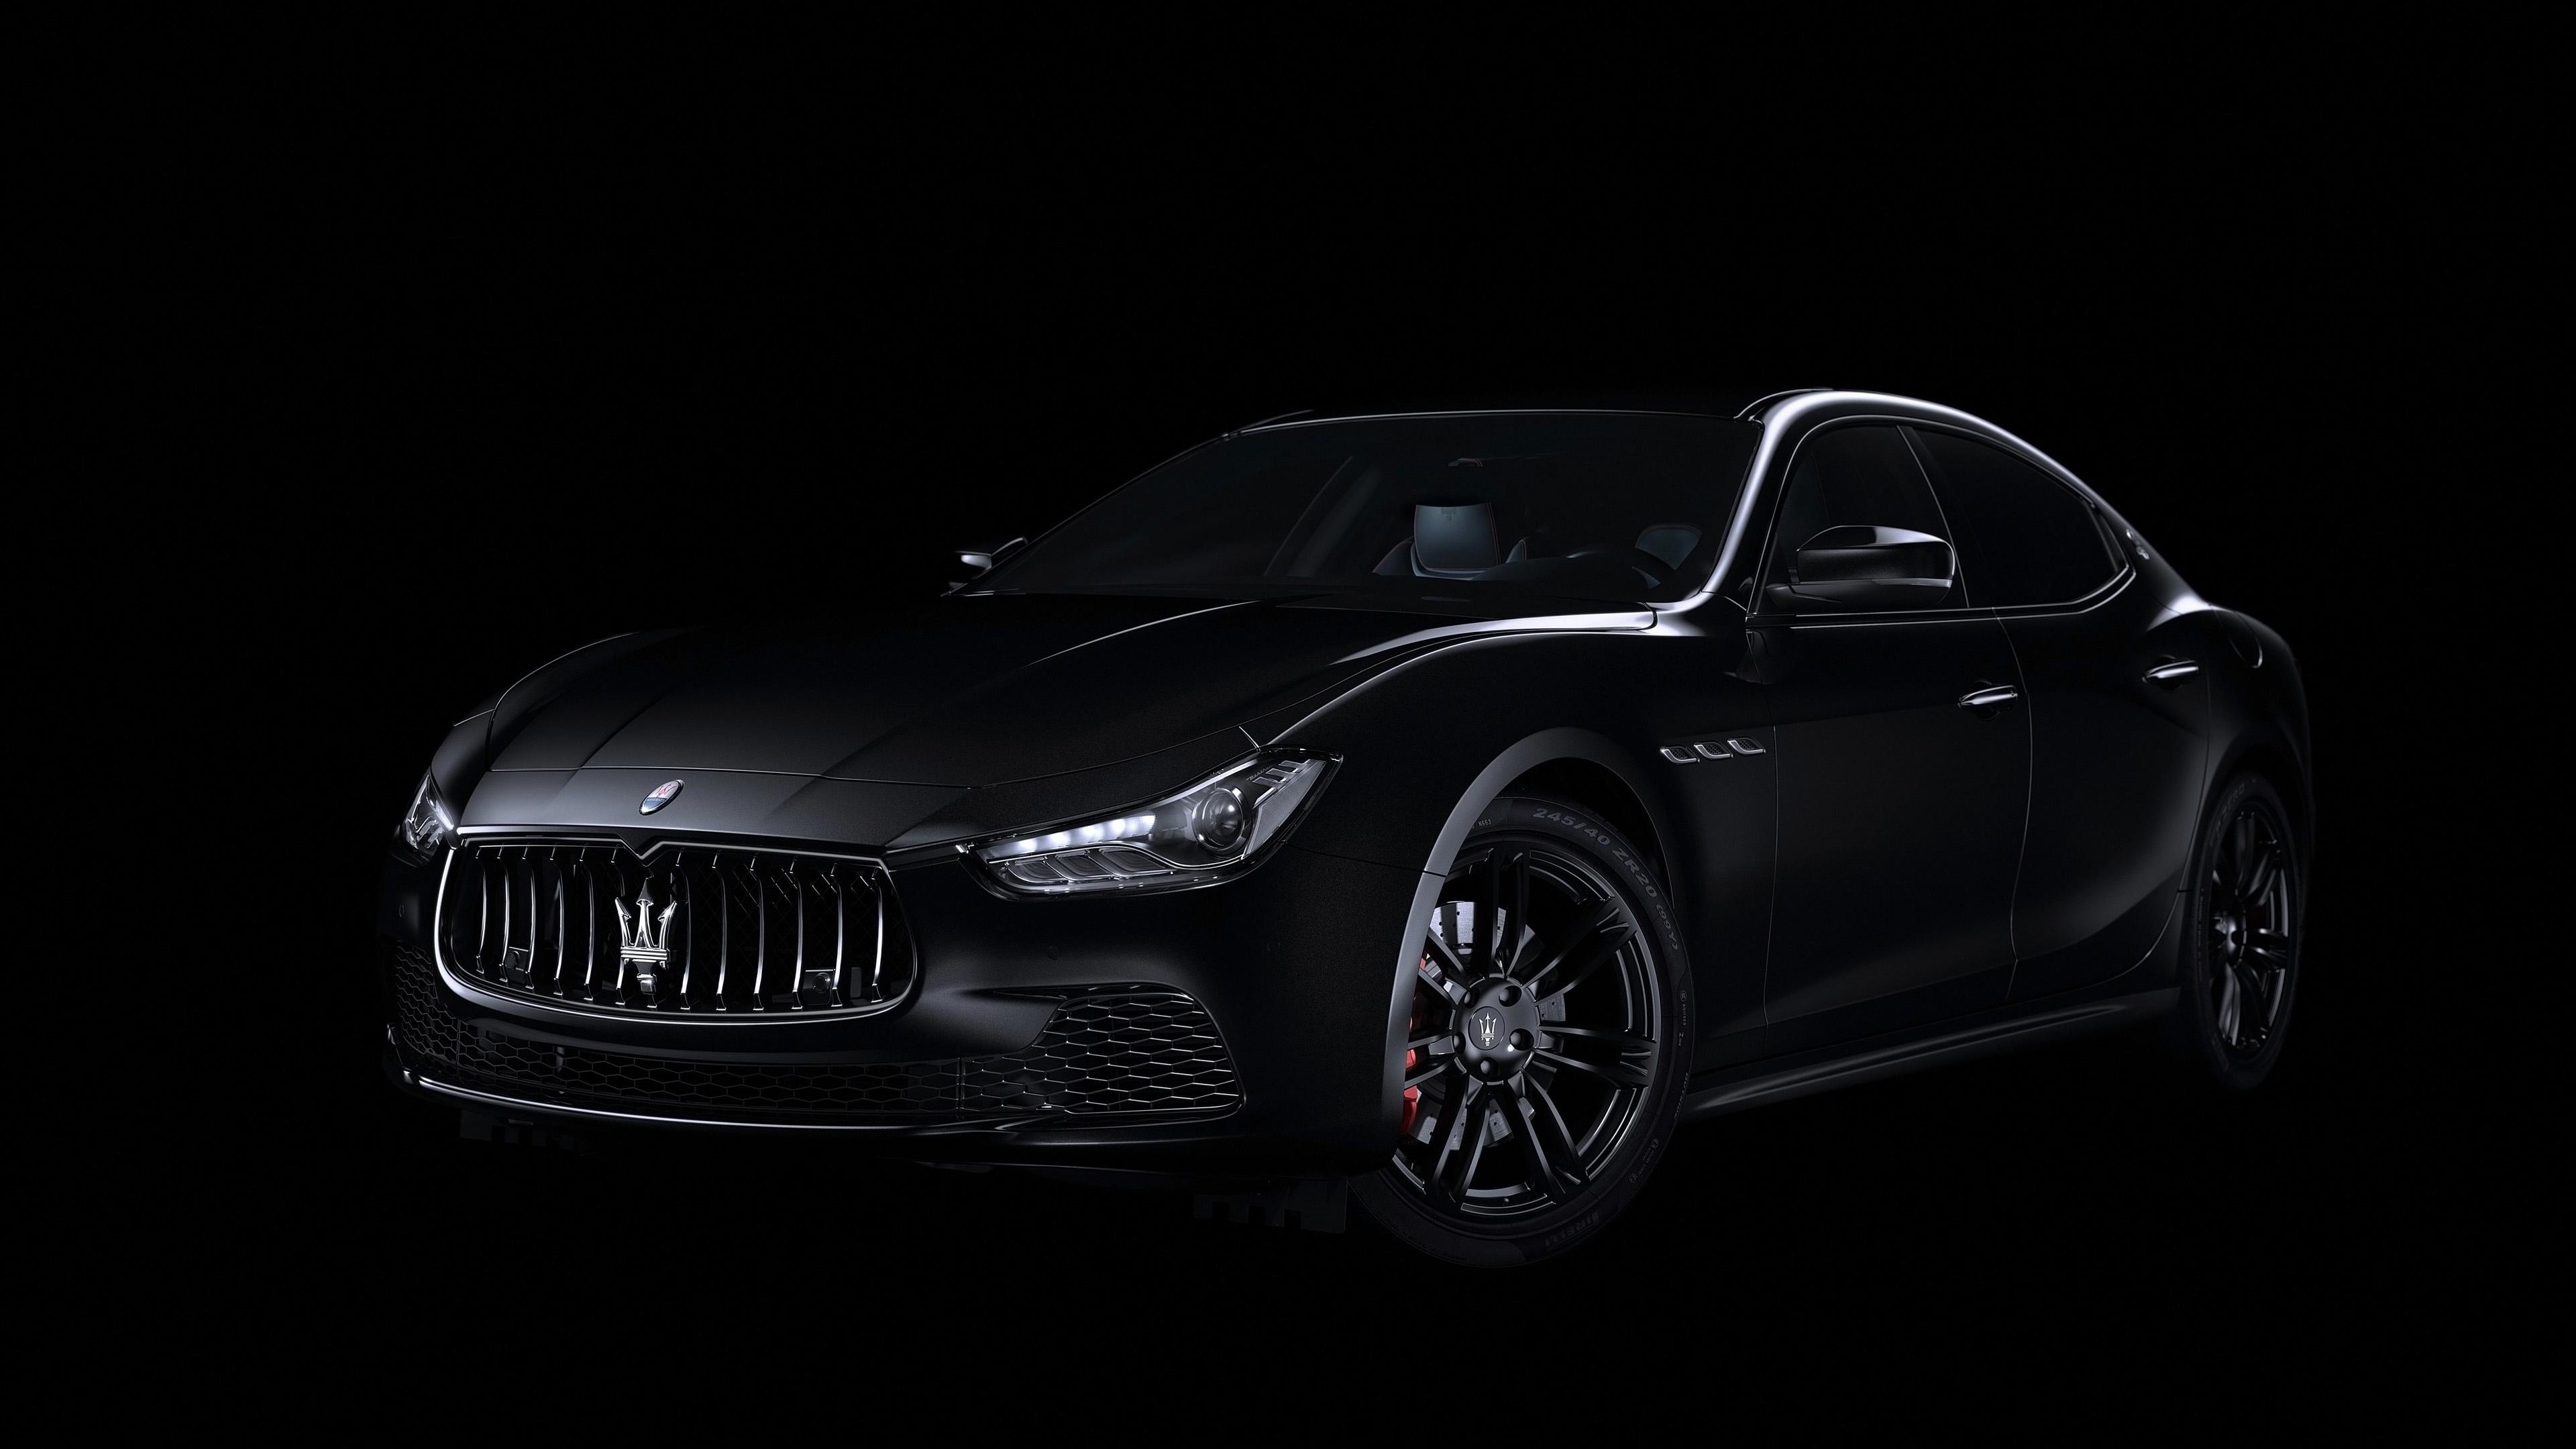 2018 Maserati Ghibli Nerissimo Black Edition 4K Wallpaper ...